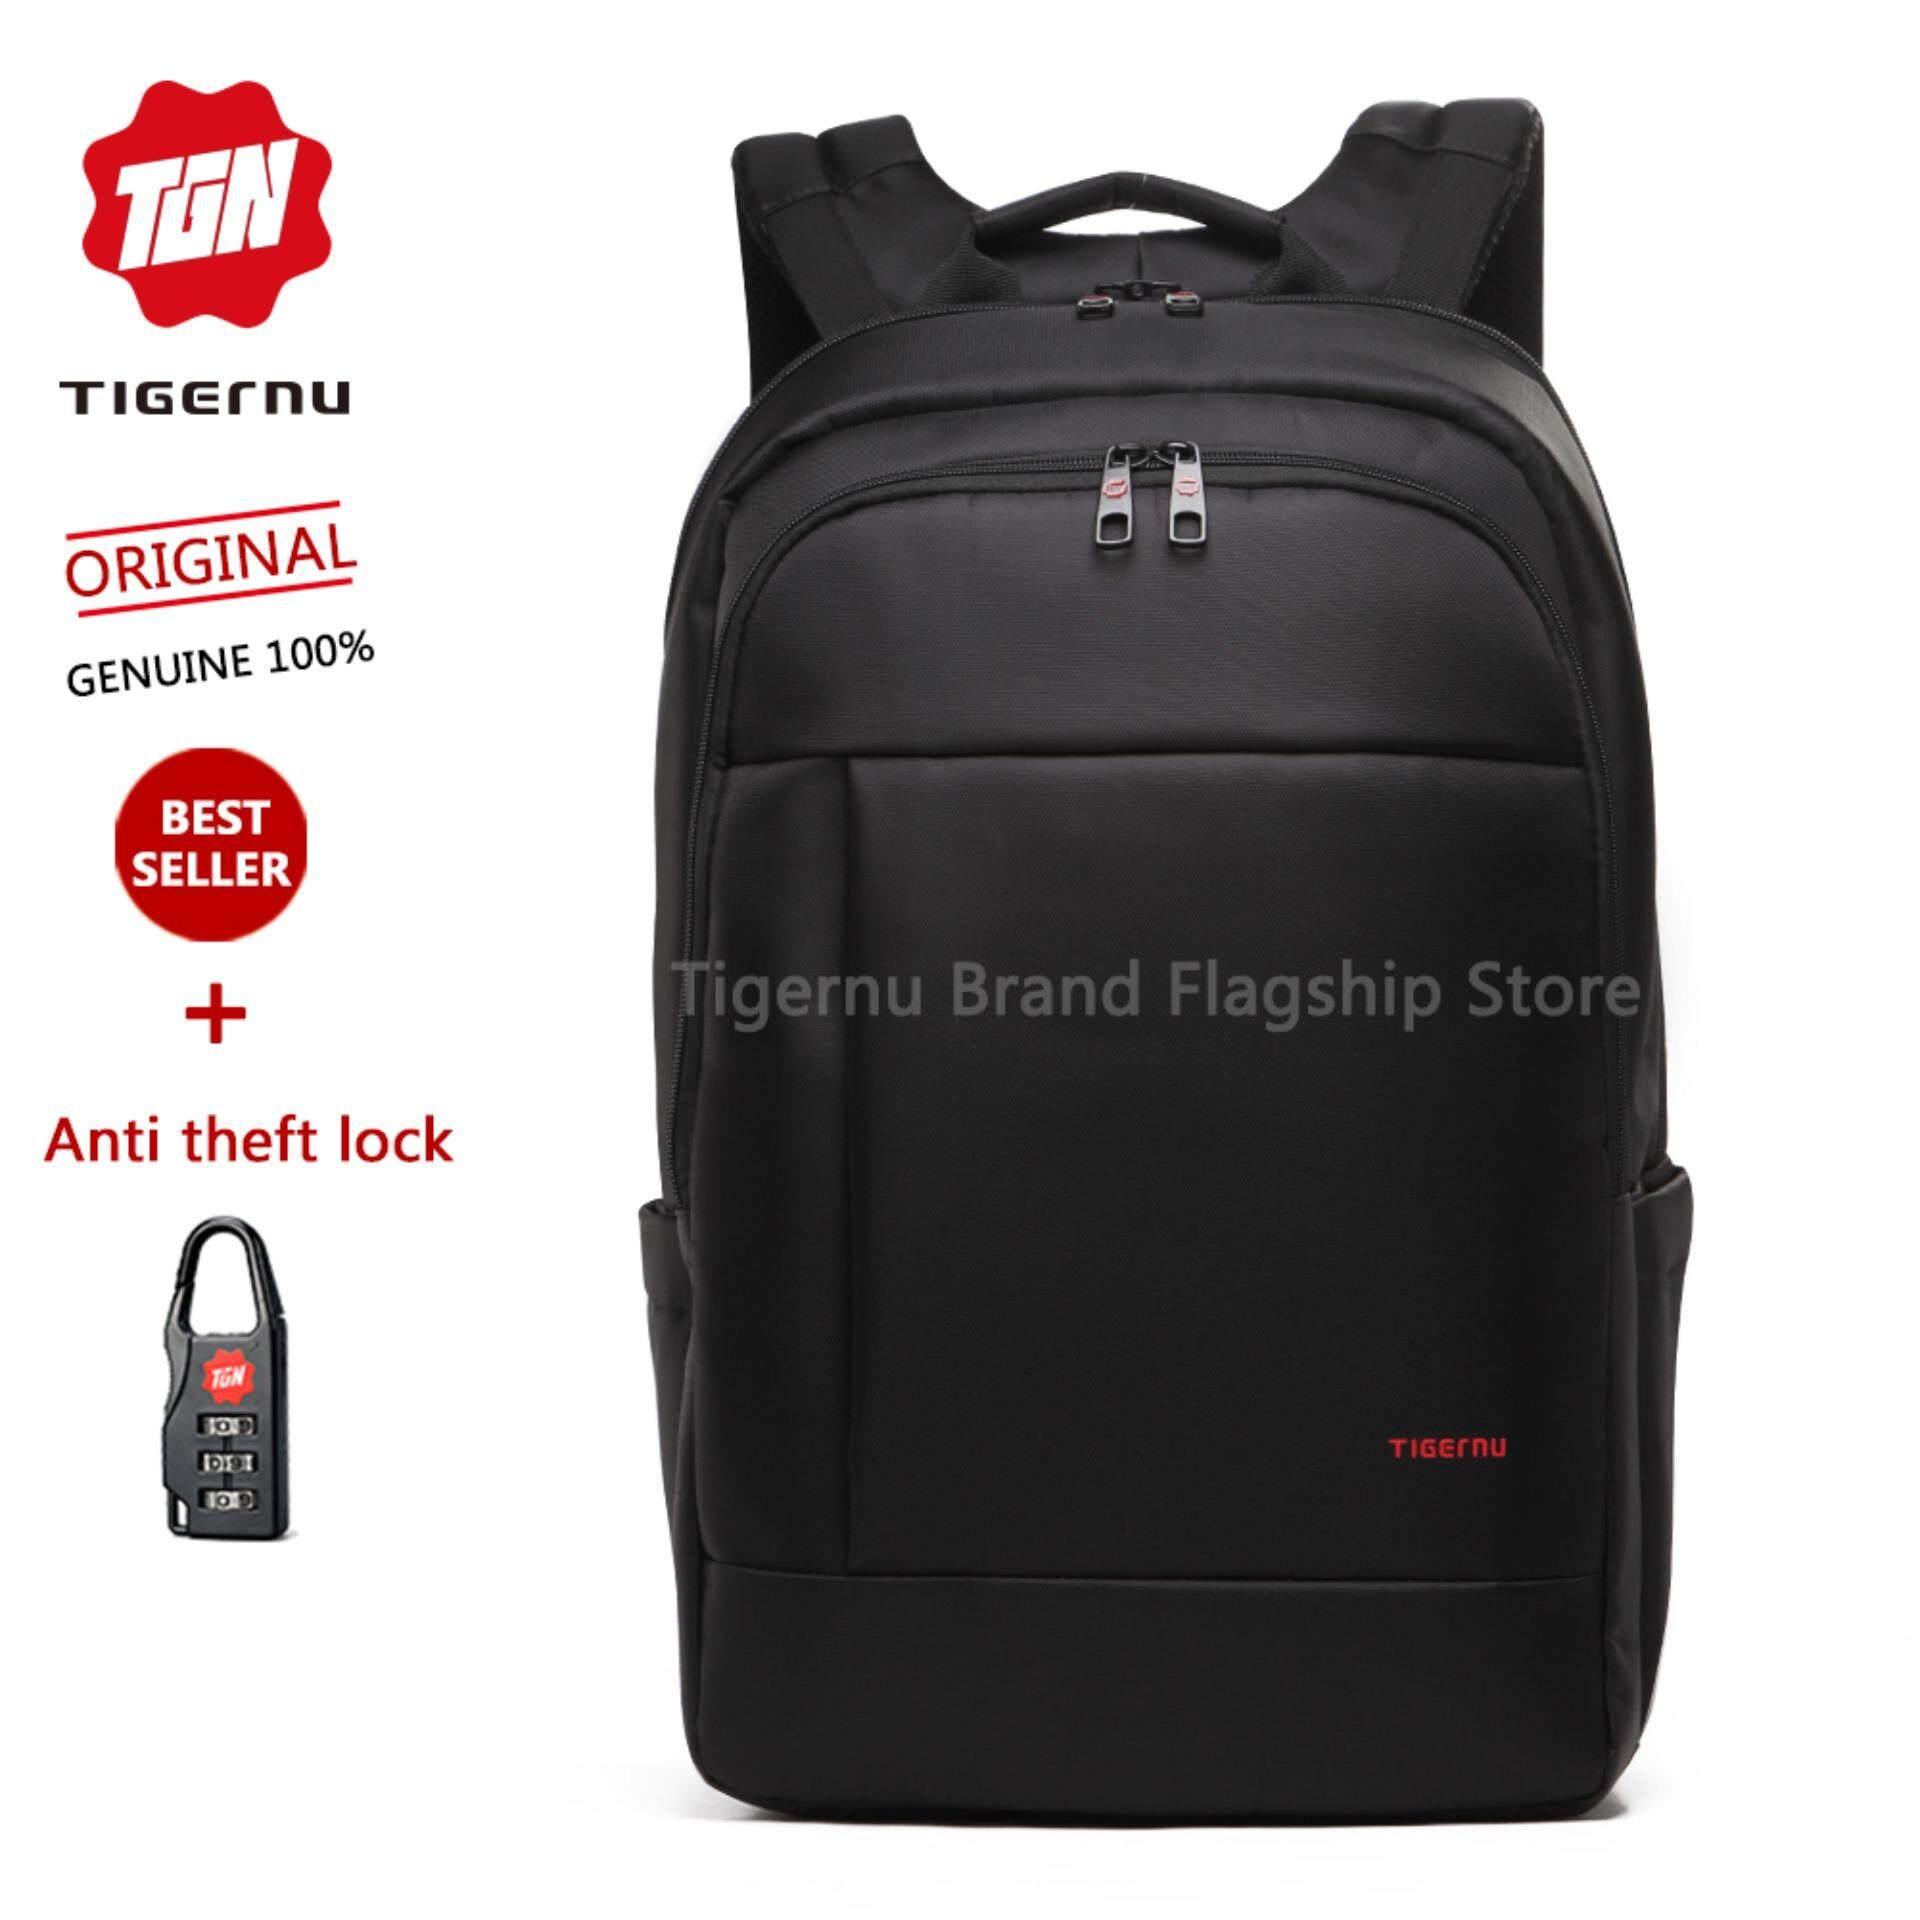 2f05ad12c7 2018Tigernu Fashion Sport Business Bag Anti-theft Men Women for 12.1-17 inch  Travel Multifunctional